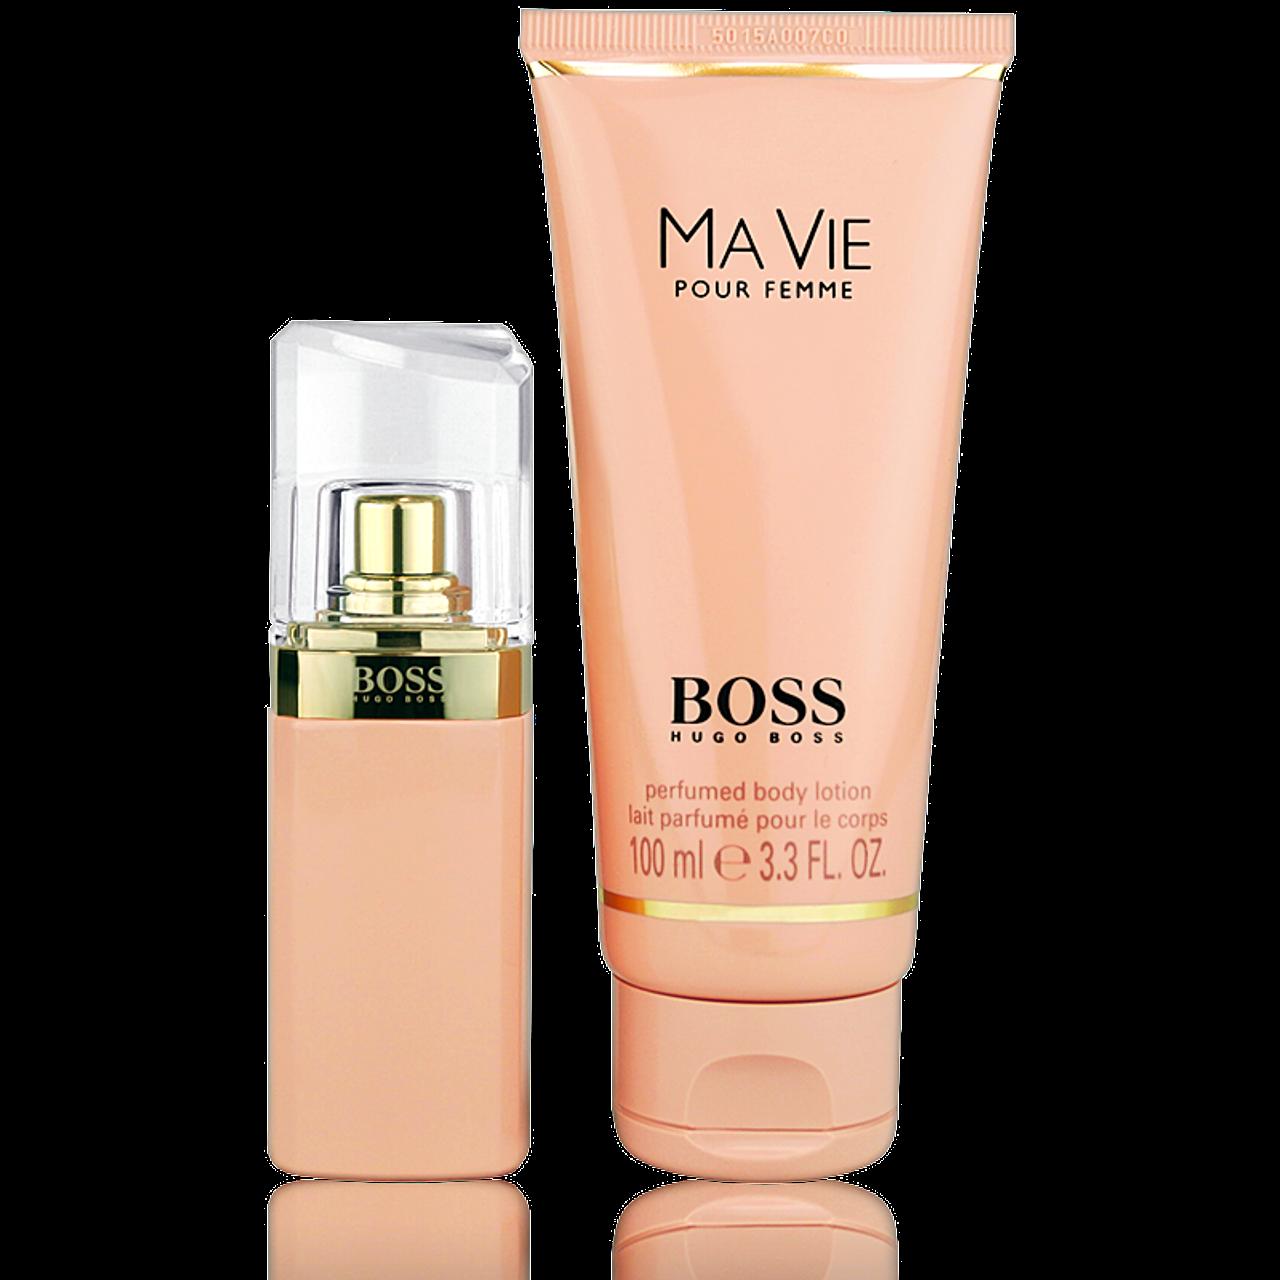 Hugo Boss Ma Vie Femme EdP 30ml + BL 100ml